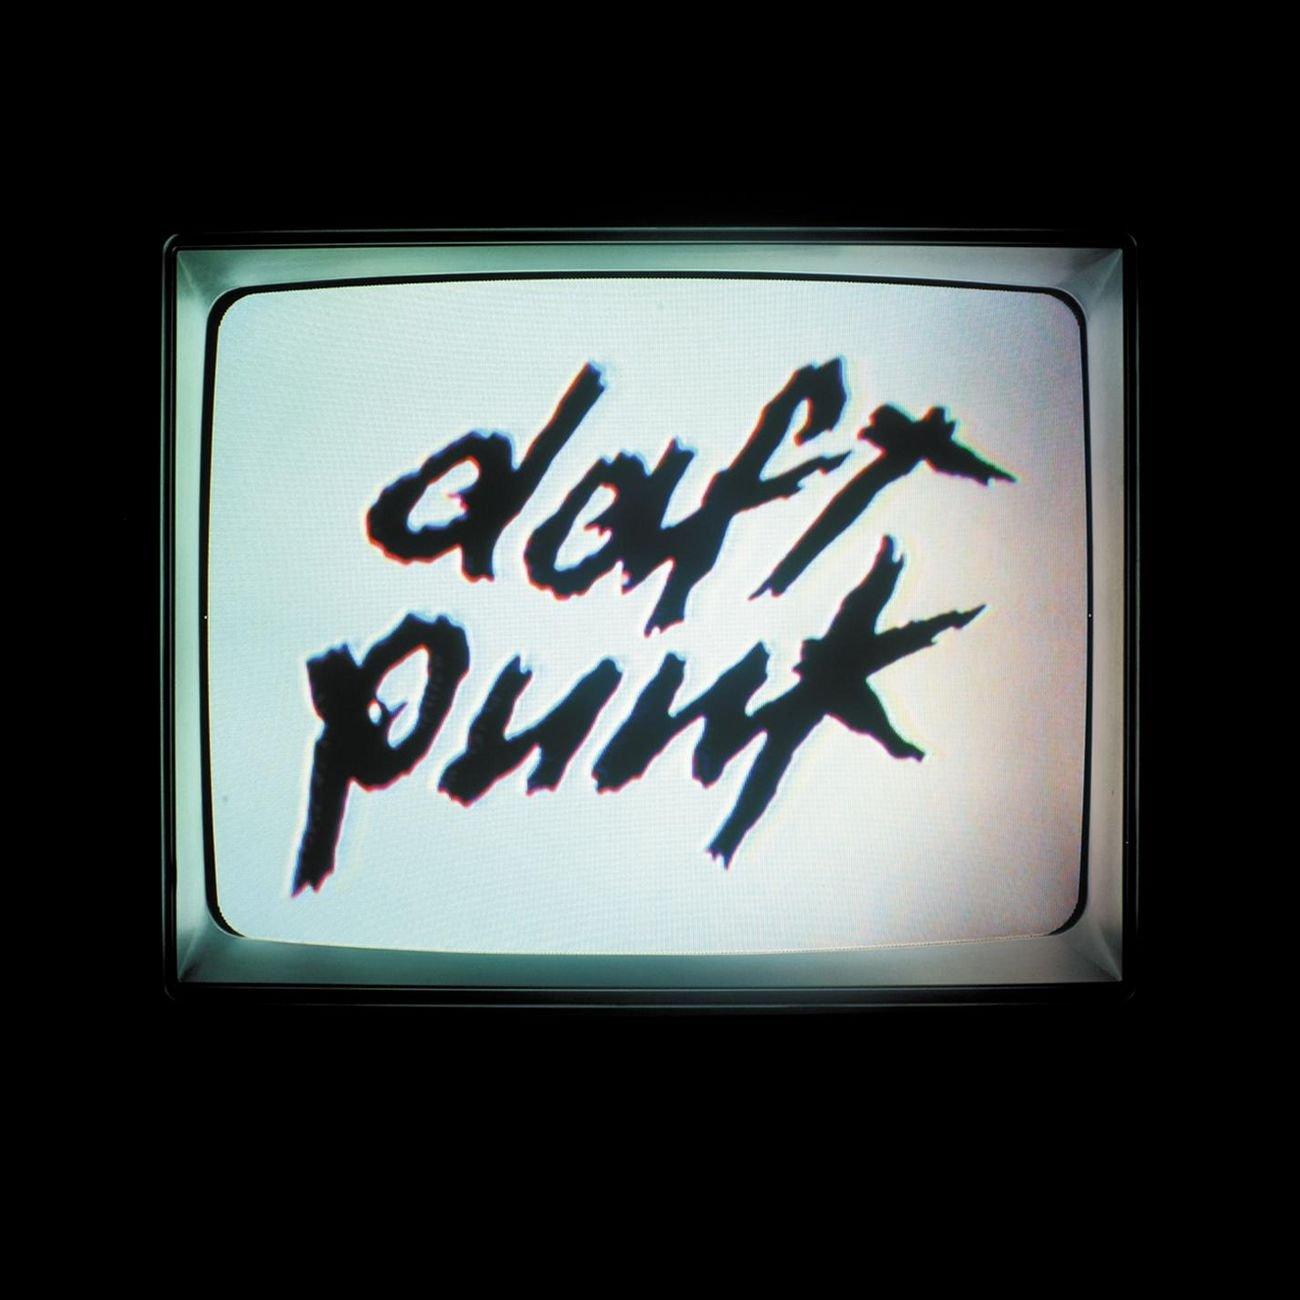 Human after all | Daft punk